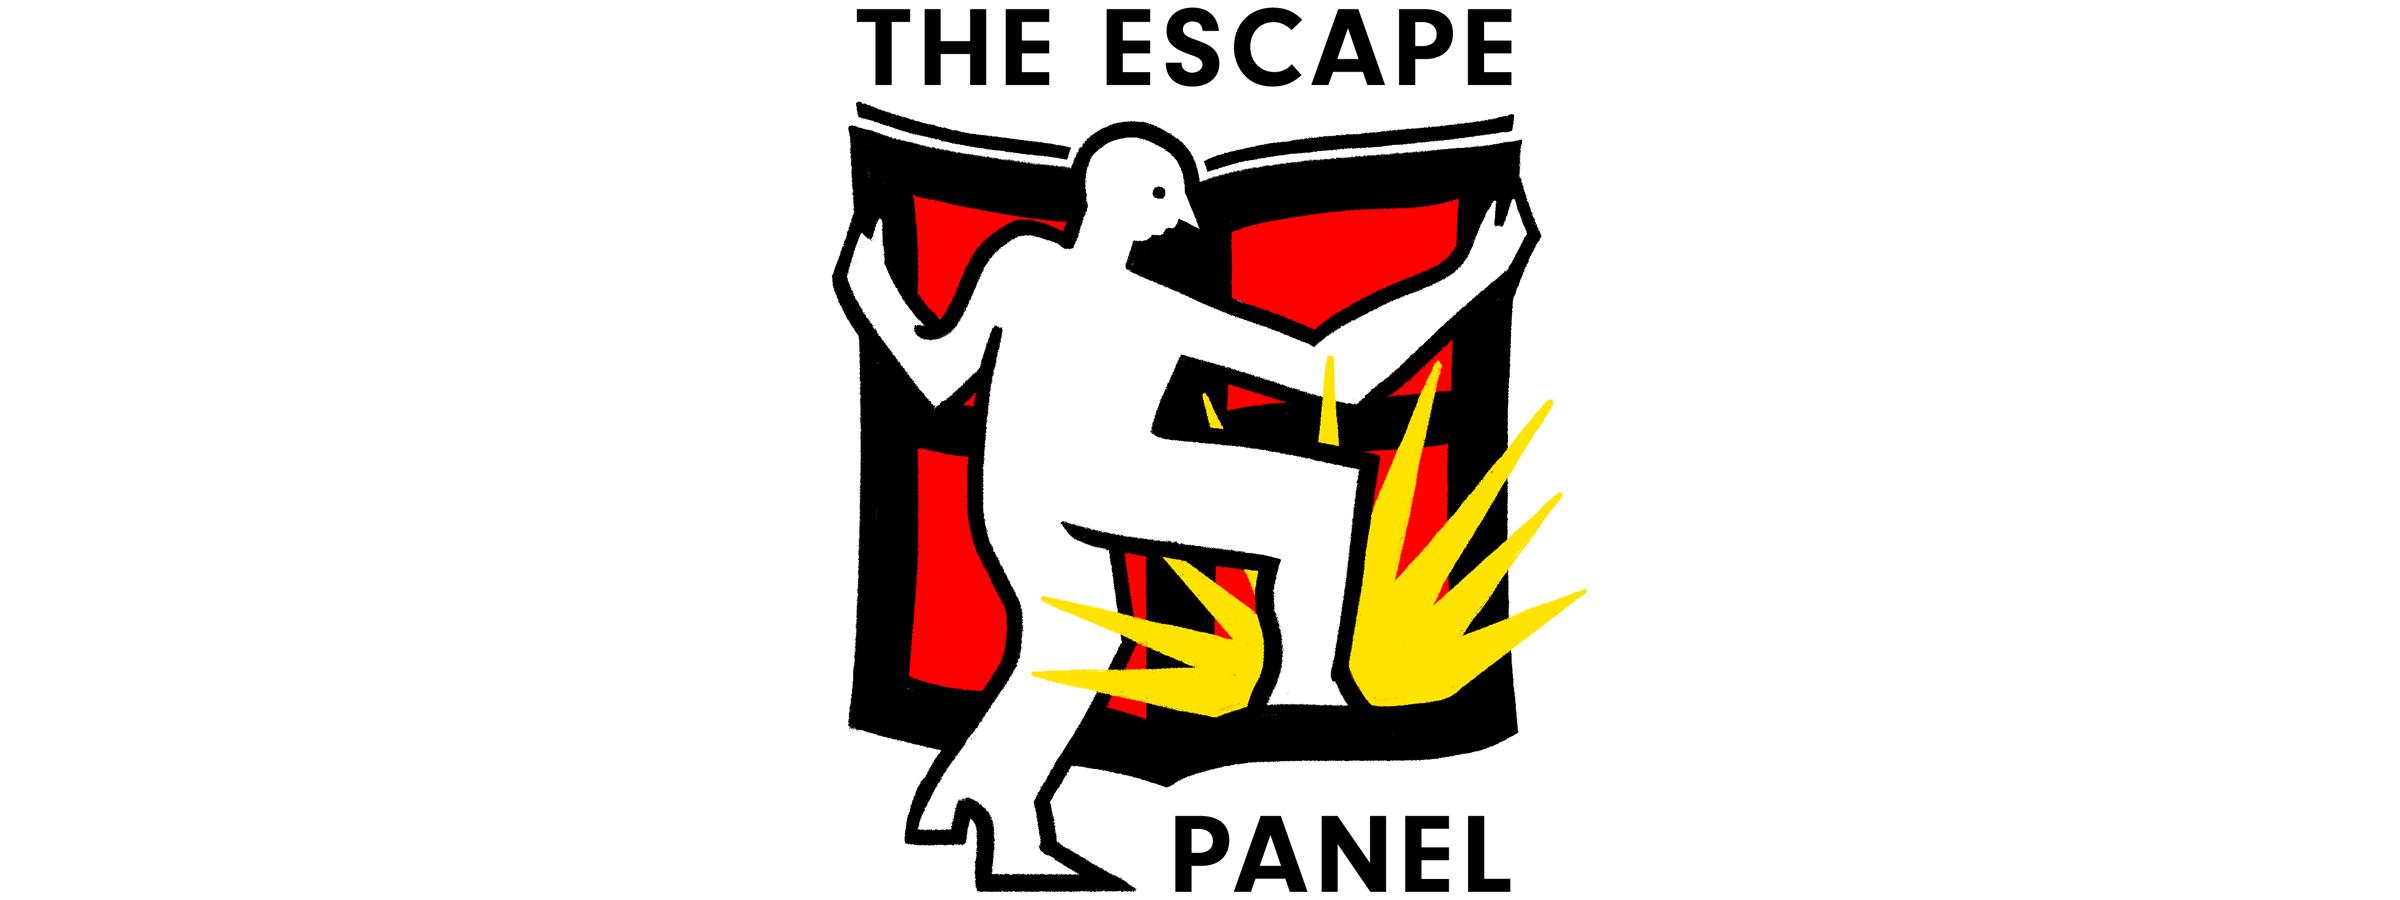 escape-banner.jpg